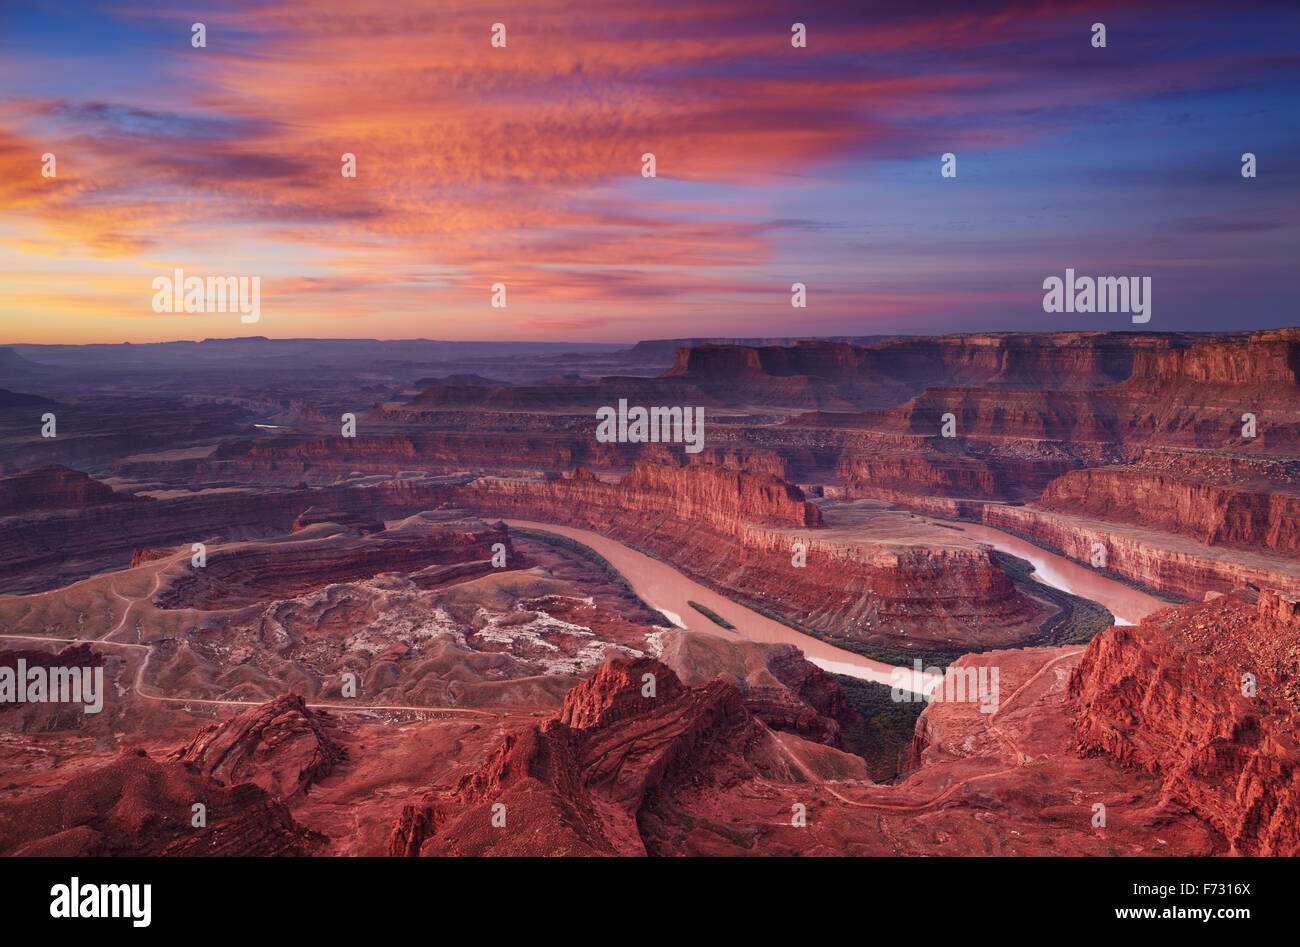 Bunte Sonnenaufgang am Dead Horse Point, Colorado River, Utah, USA Stockbild